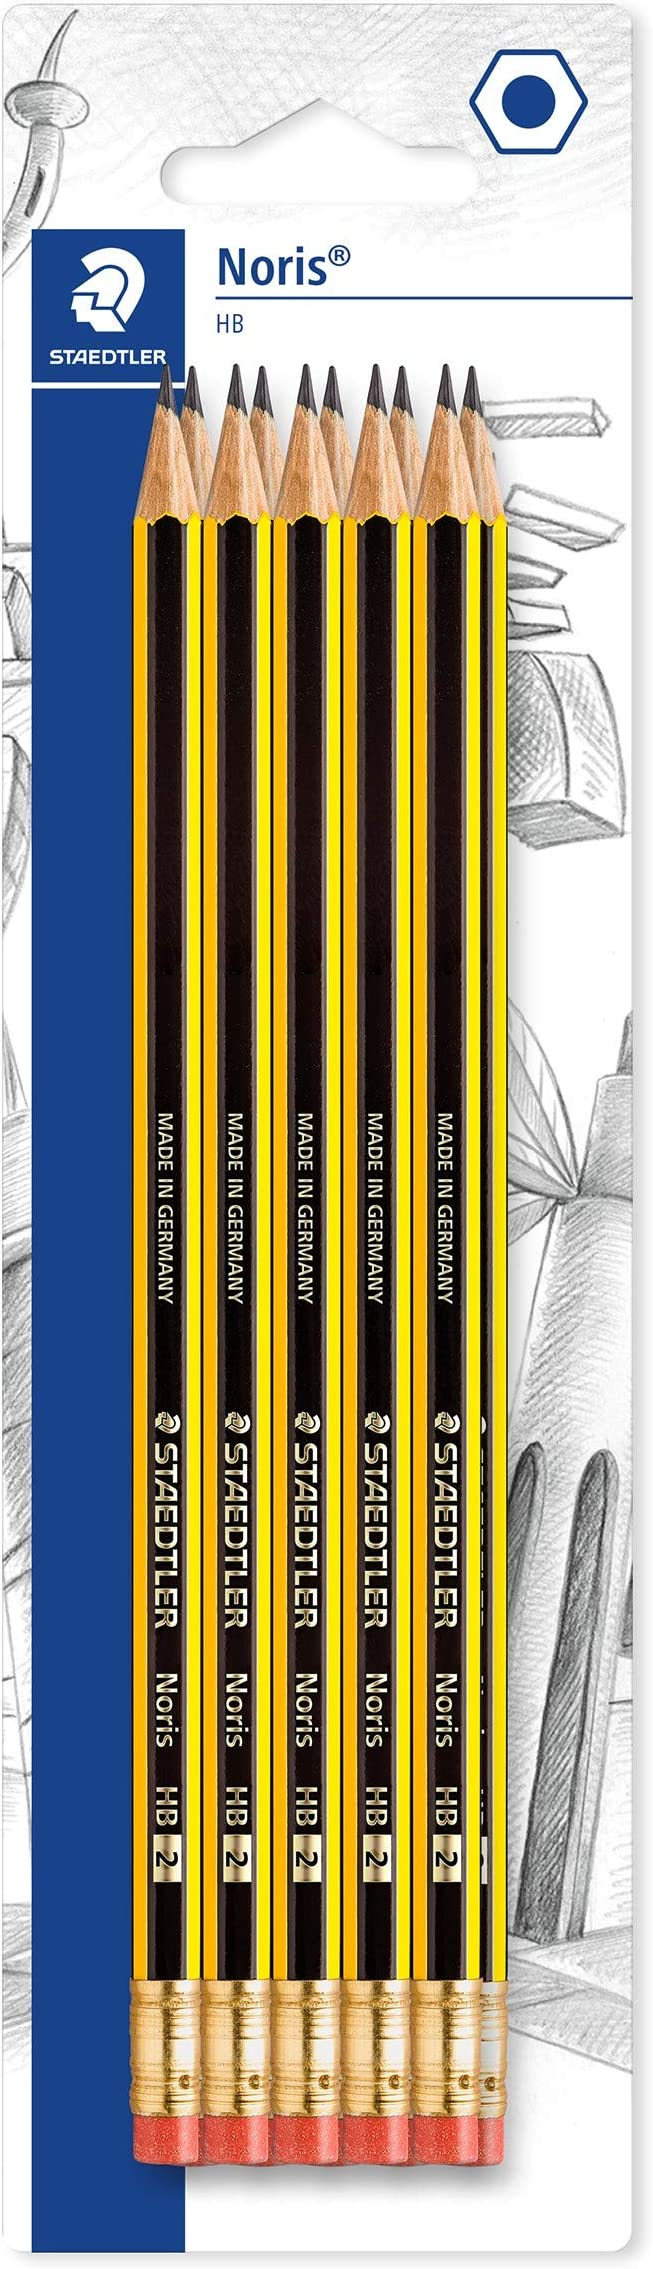 STAEDTLER Noris Ergosoft D/égr/é Of Hardness 2B Pencils Pack Of 6